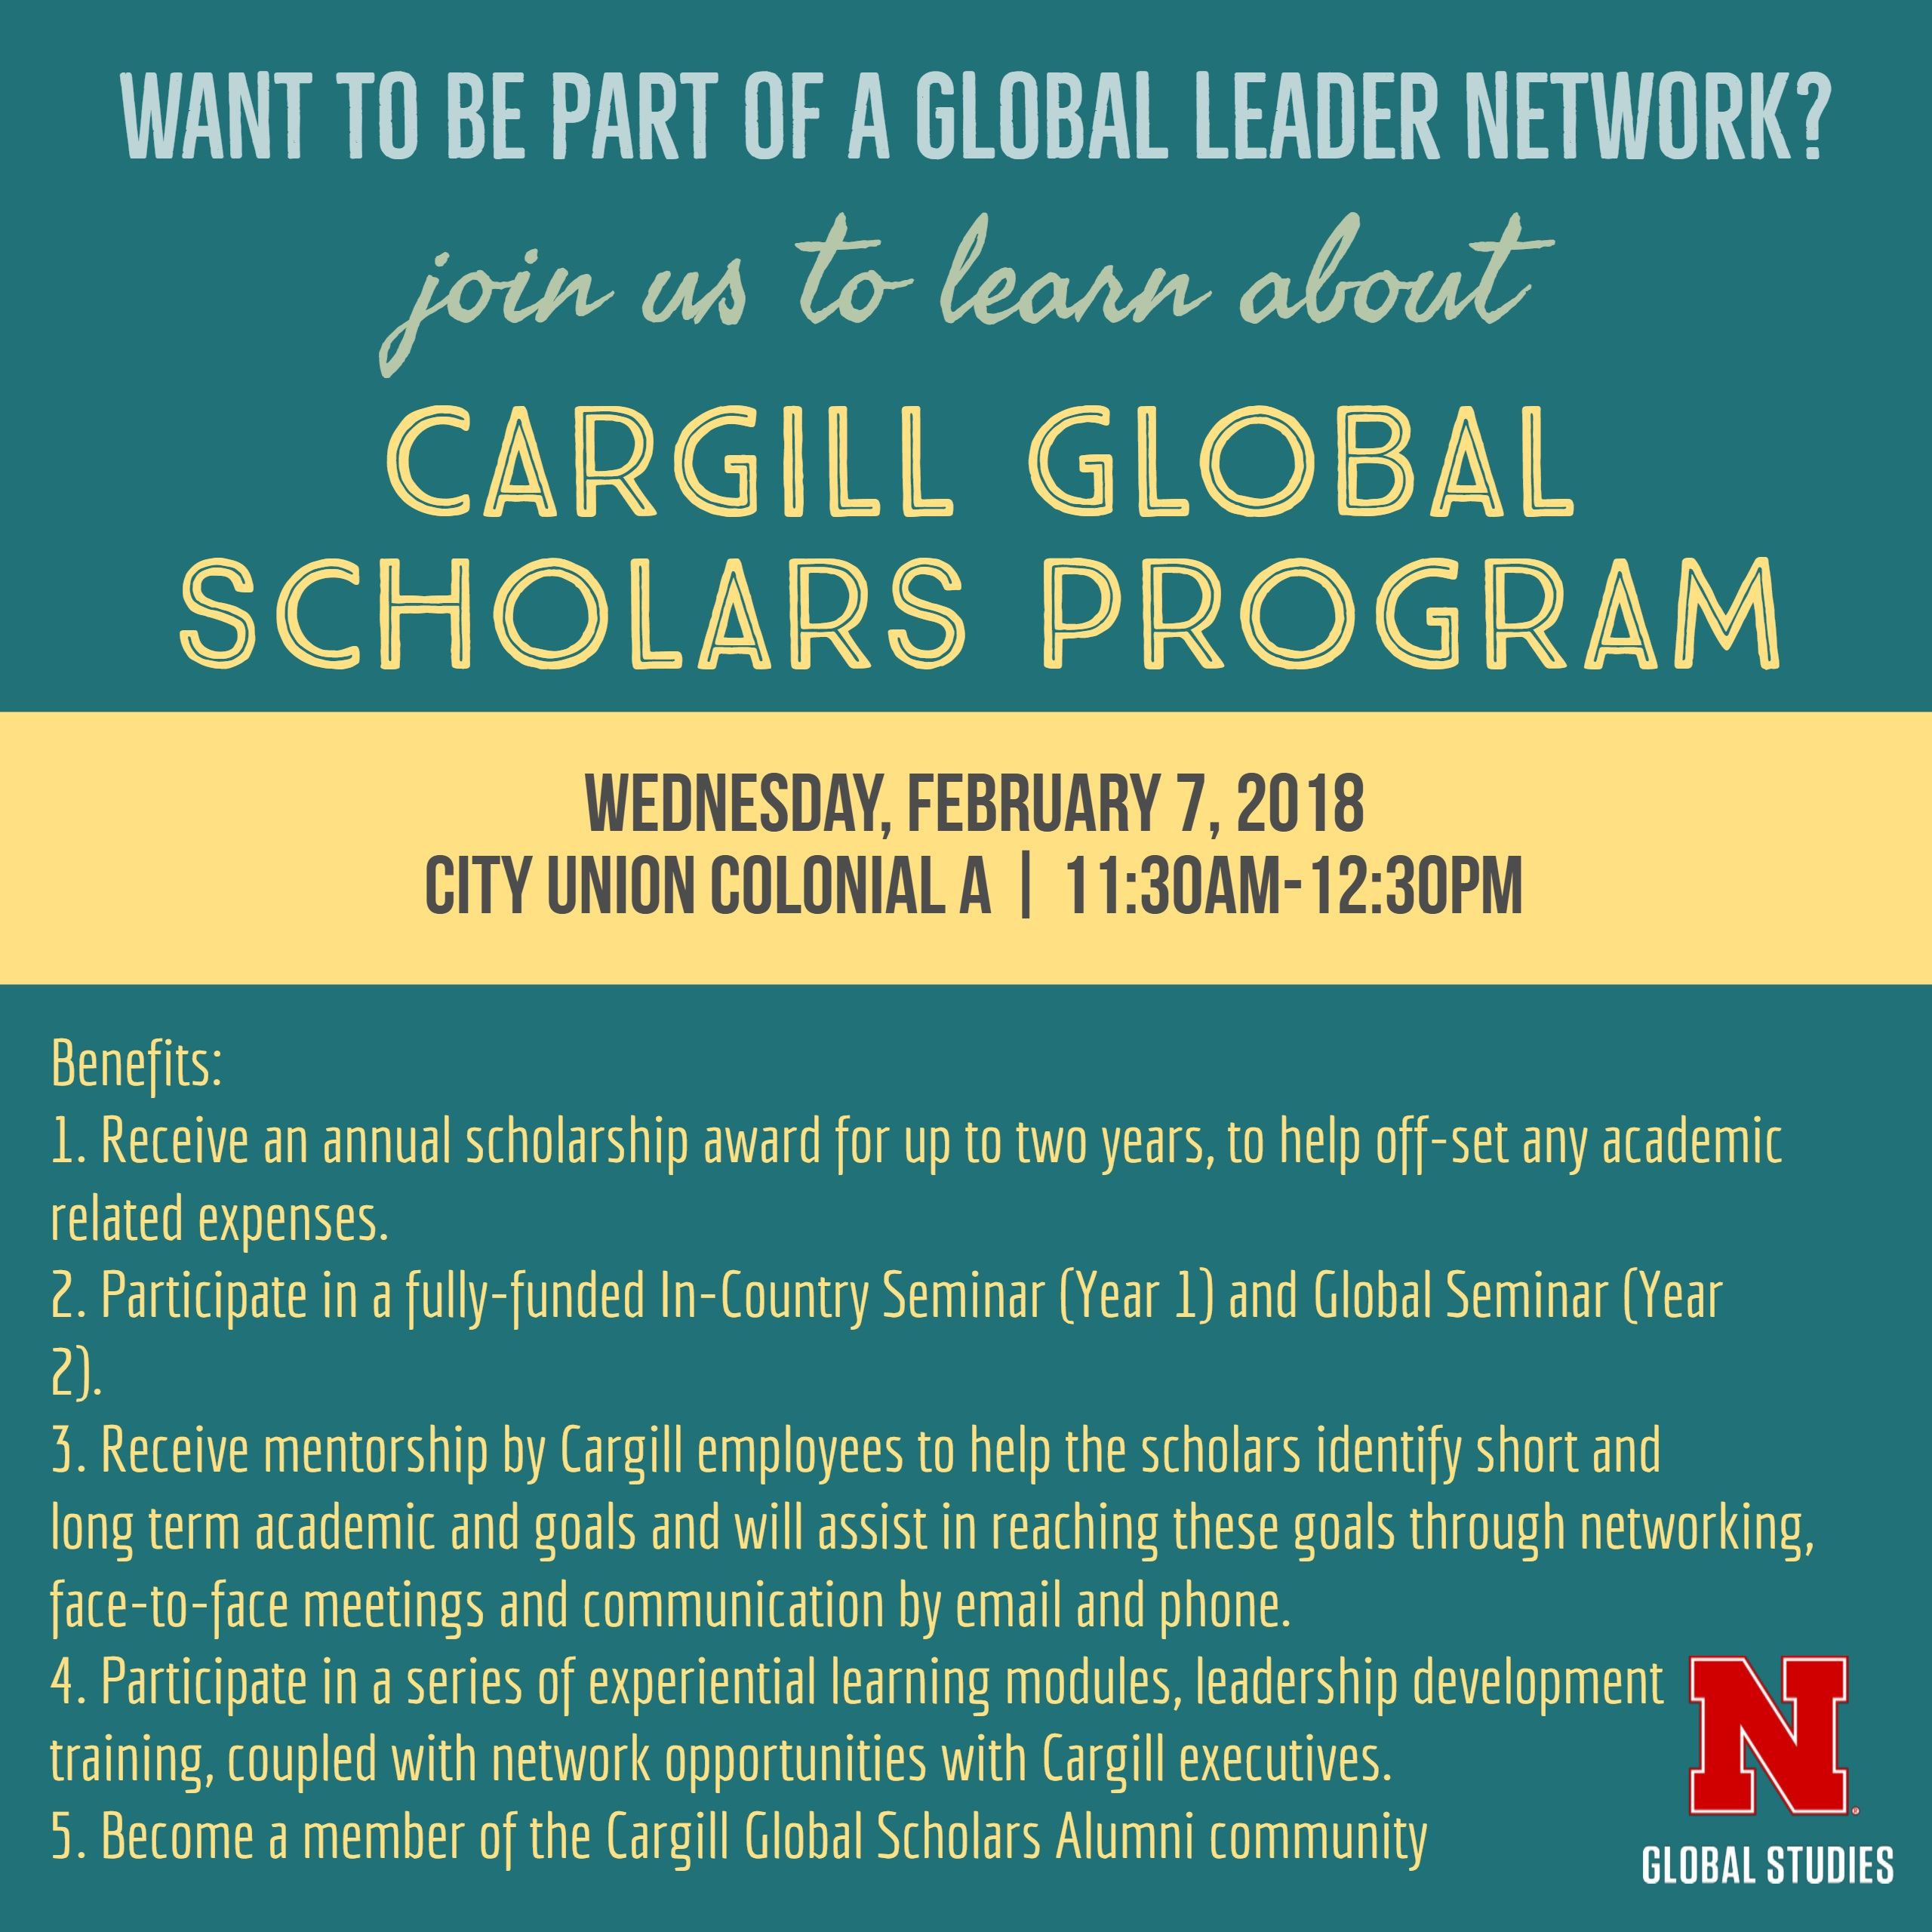 Information Session on a Global Leader Network